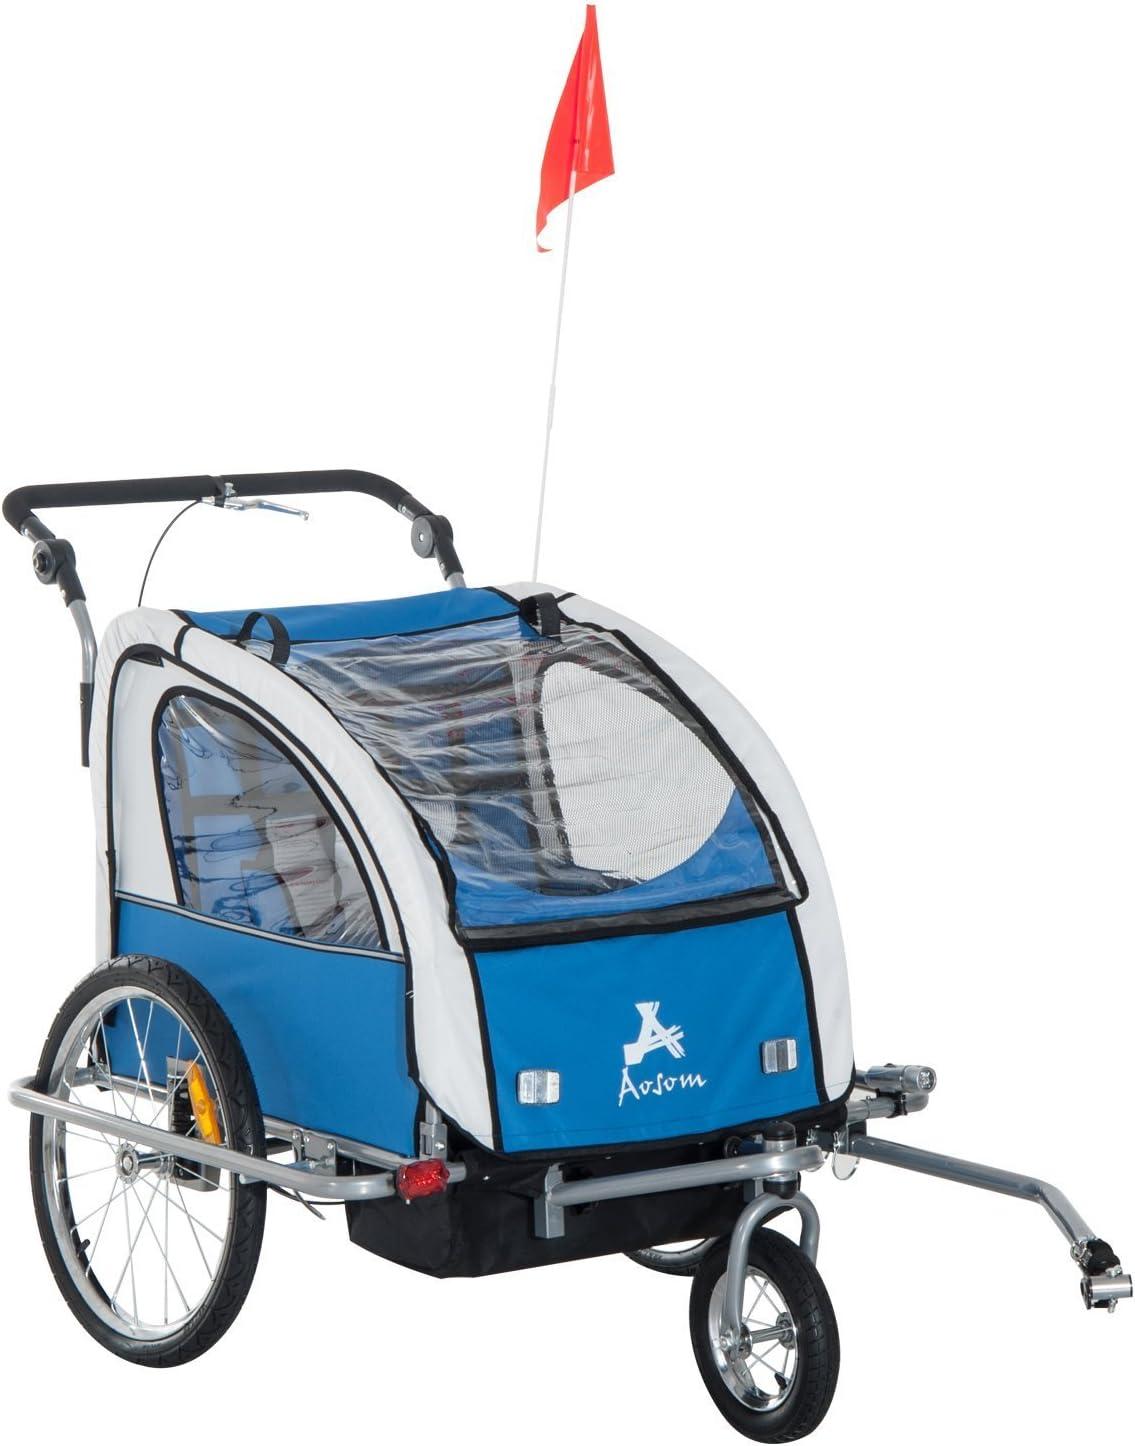 HOMCOM Remolque Infantil para Bicicleta 2 PLAZAS Rueda Giratoria 360° y Amortiguadores CON BARRA INCLUIDA Kit de Footing COLOR Azul